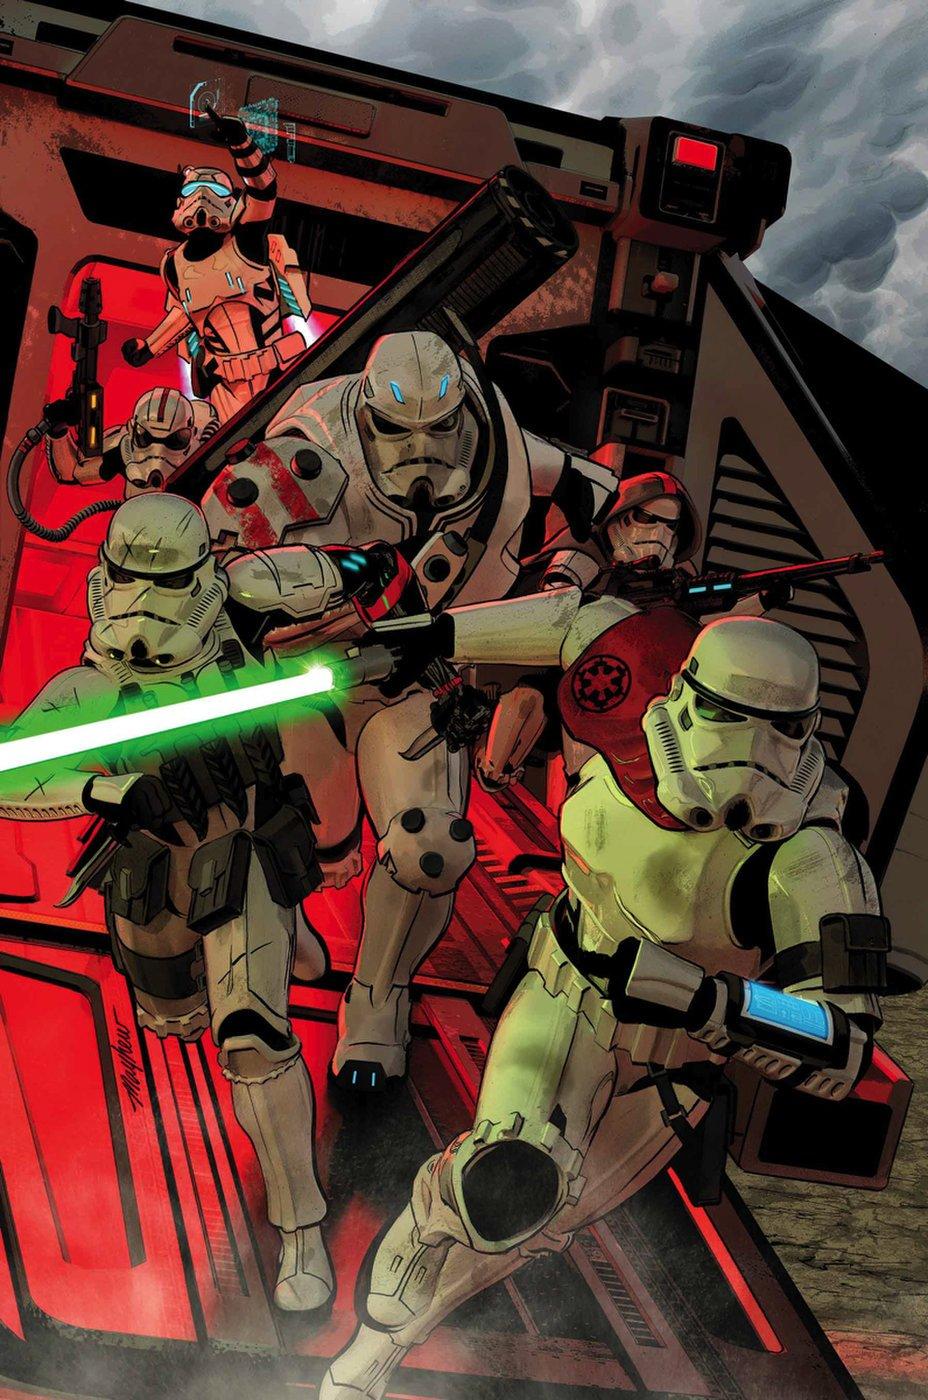 Download STAR WARS #37 VOL 4 COVER A release date 10/4/17 ebook